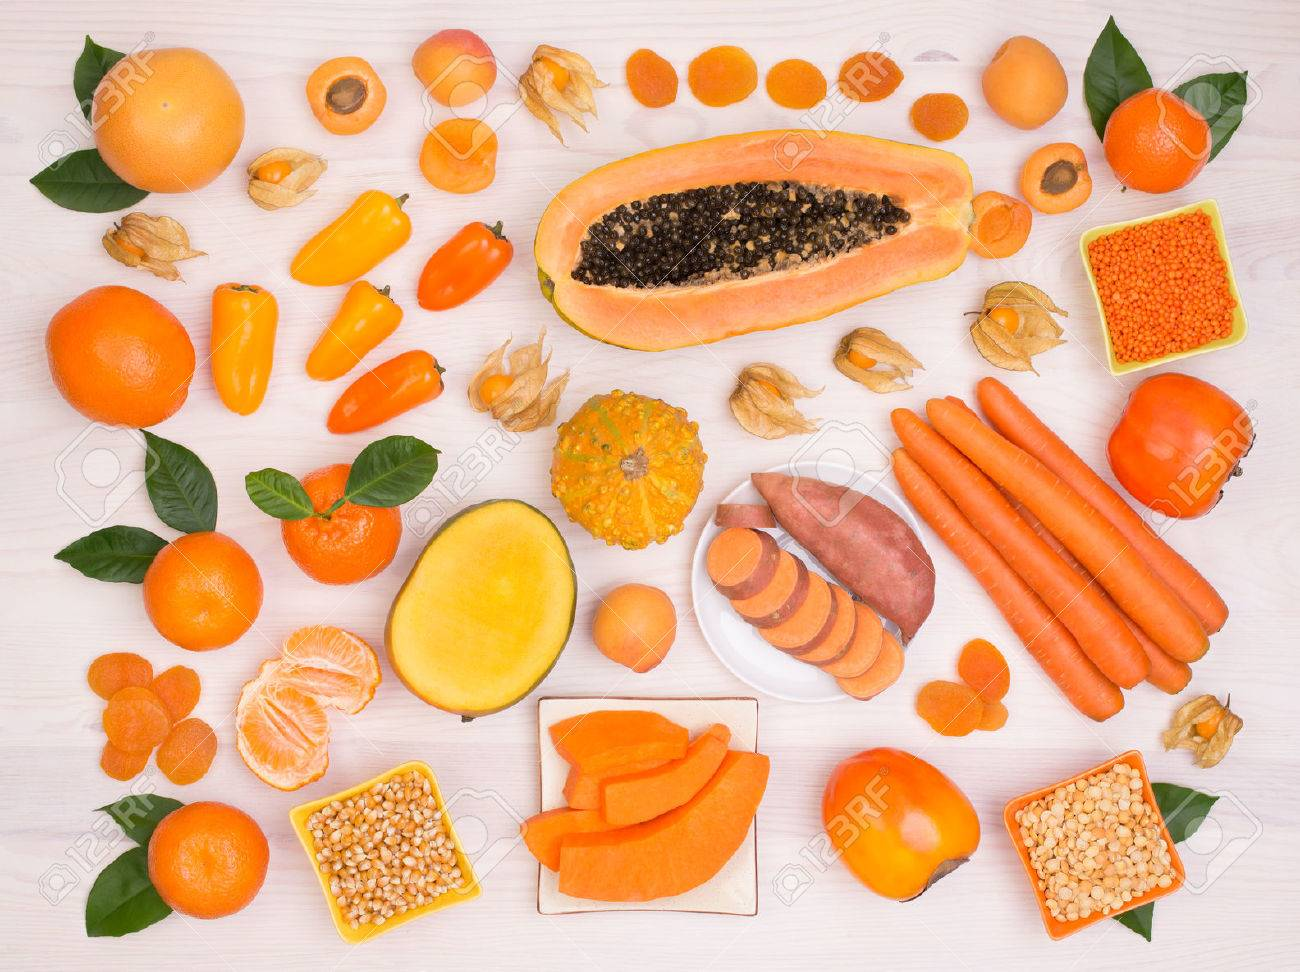 Chất chống oxy hóa: Beta-carotene